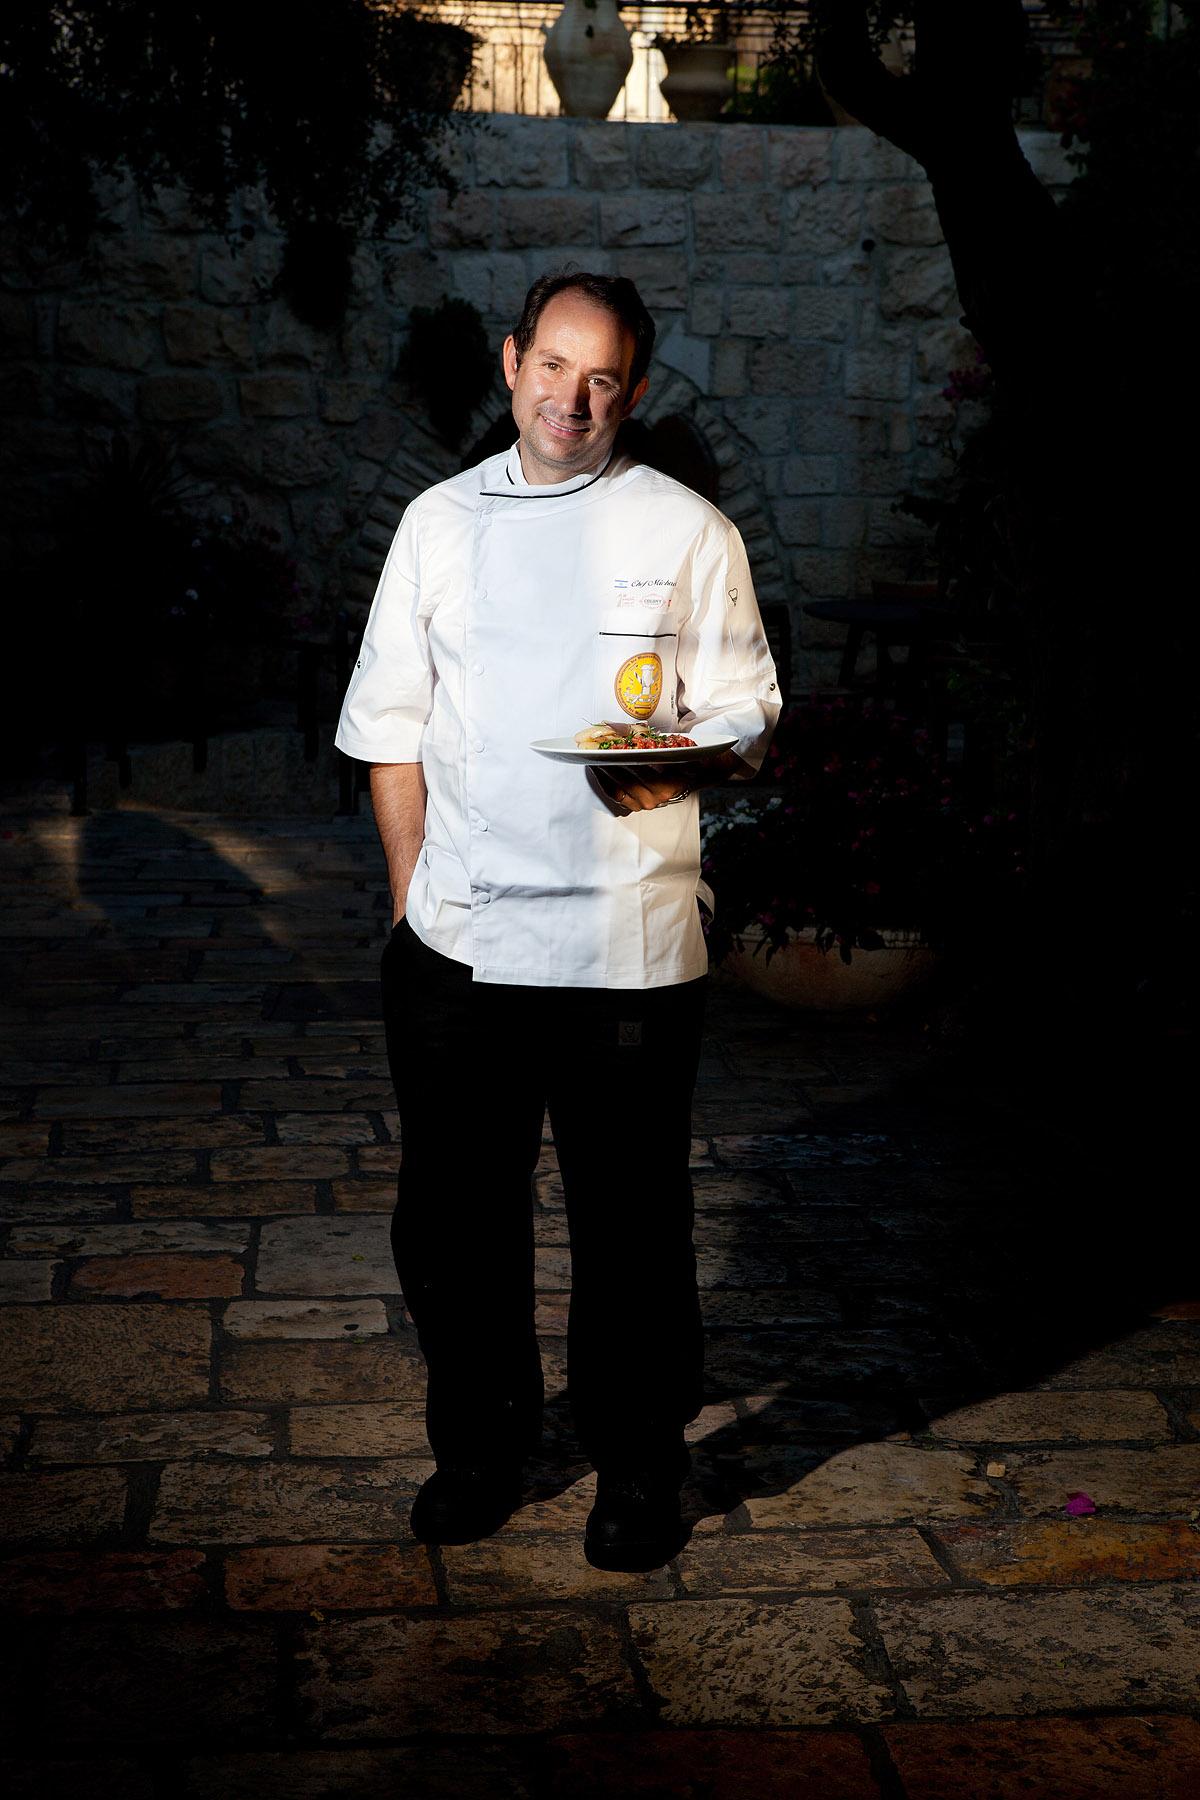 chef205.jpg